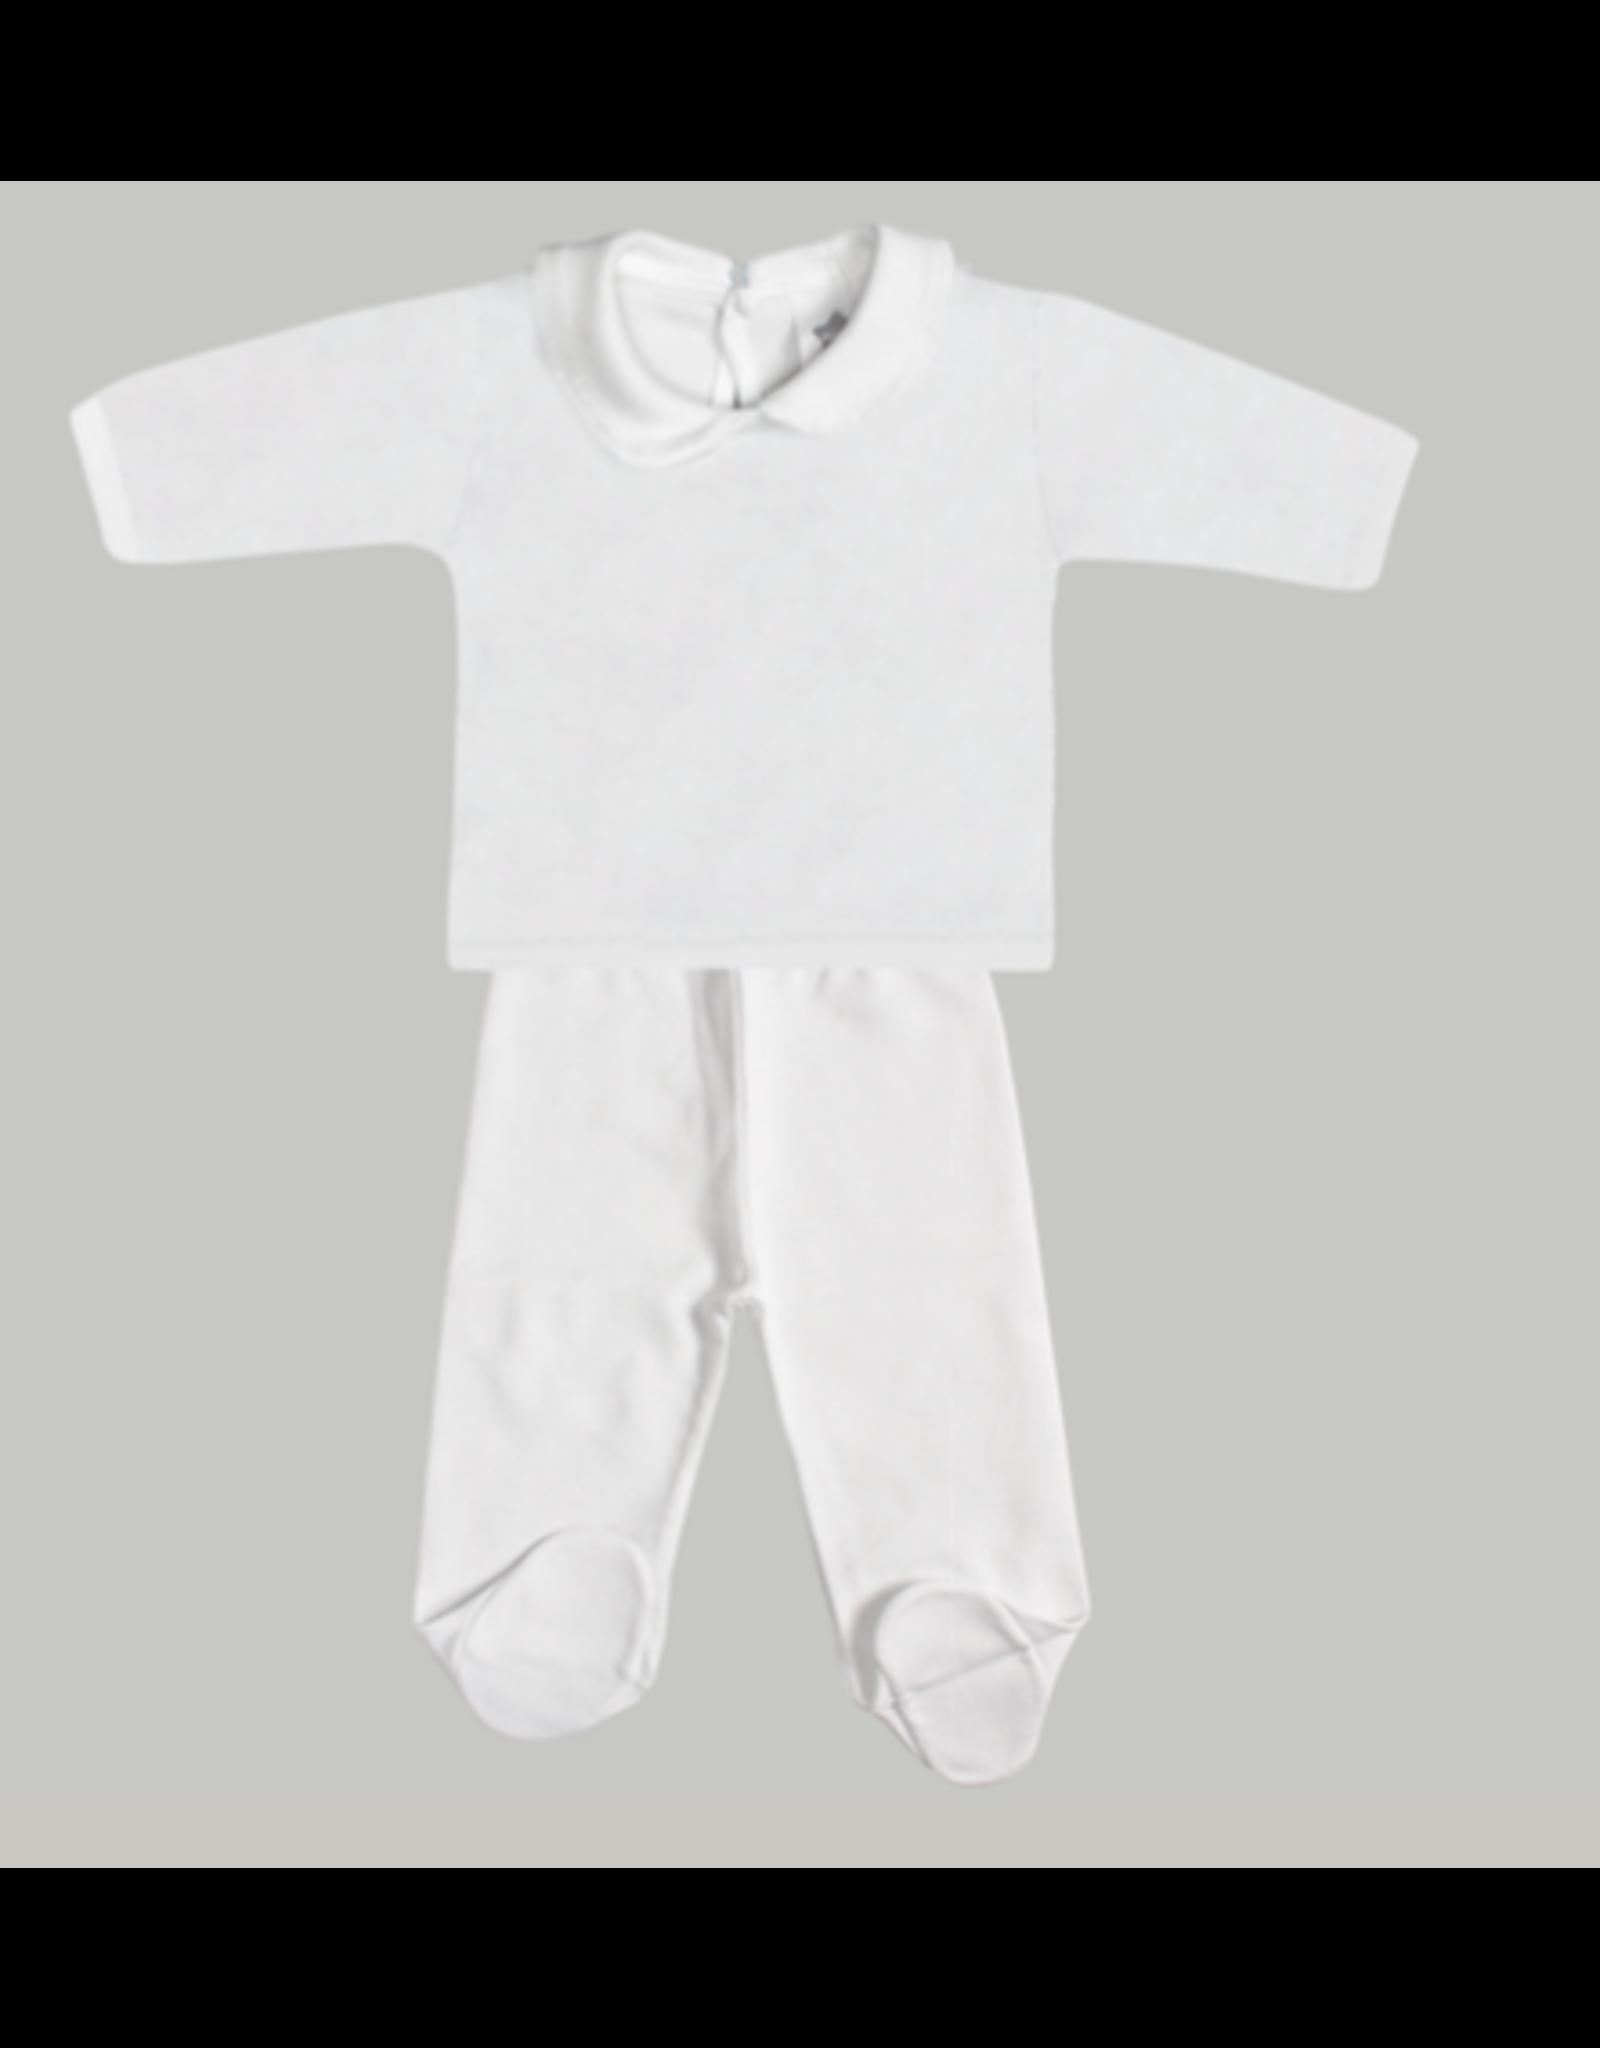 MINHON White Round Collar Set